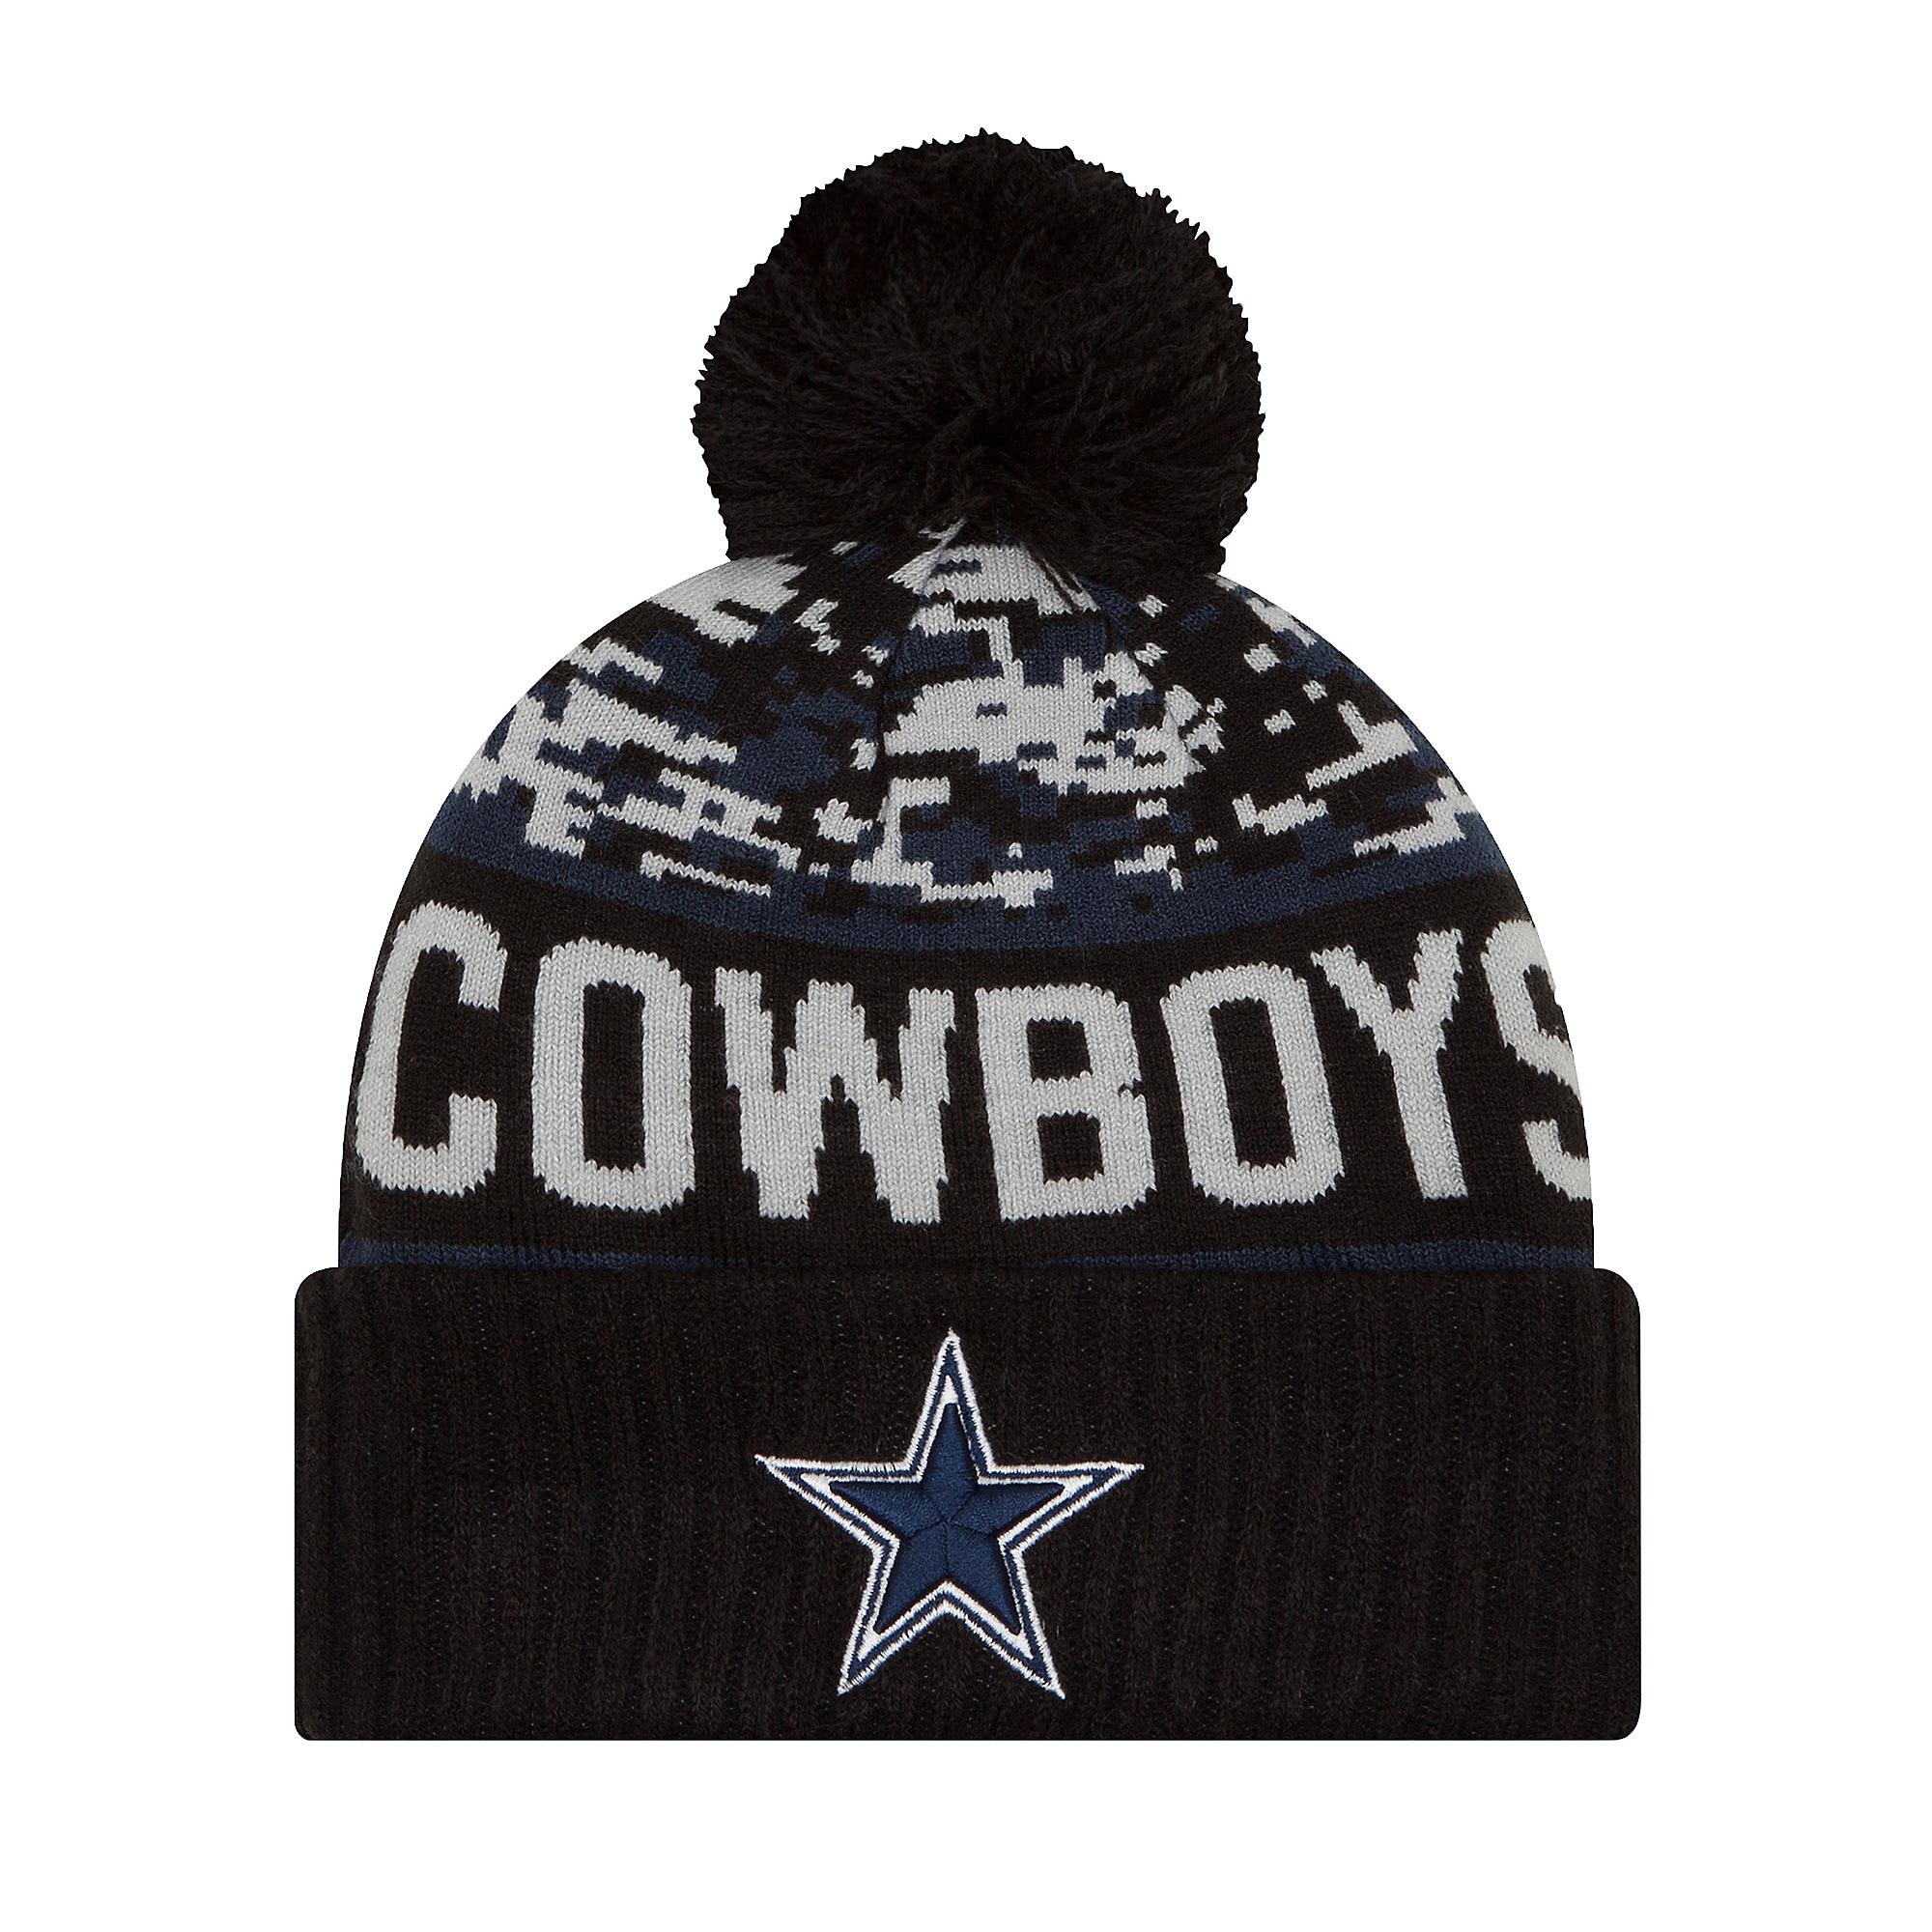 7b168c2a712 Dallas Cowboys New Era Winter Freeze Knit Hat